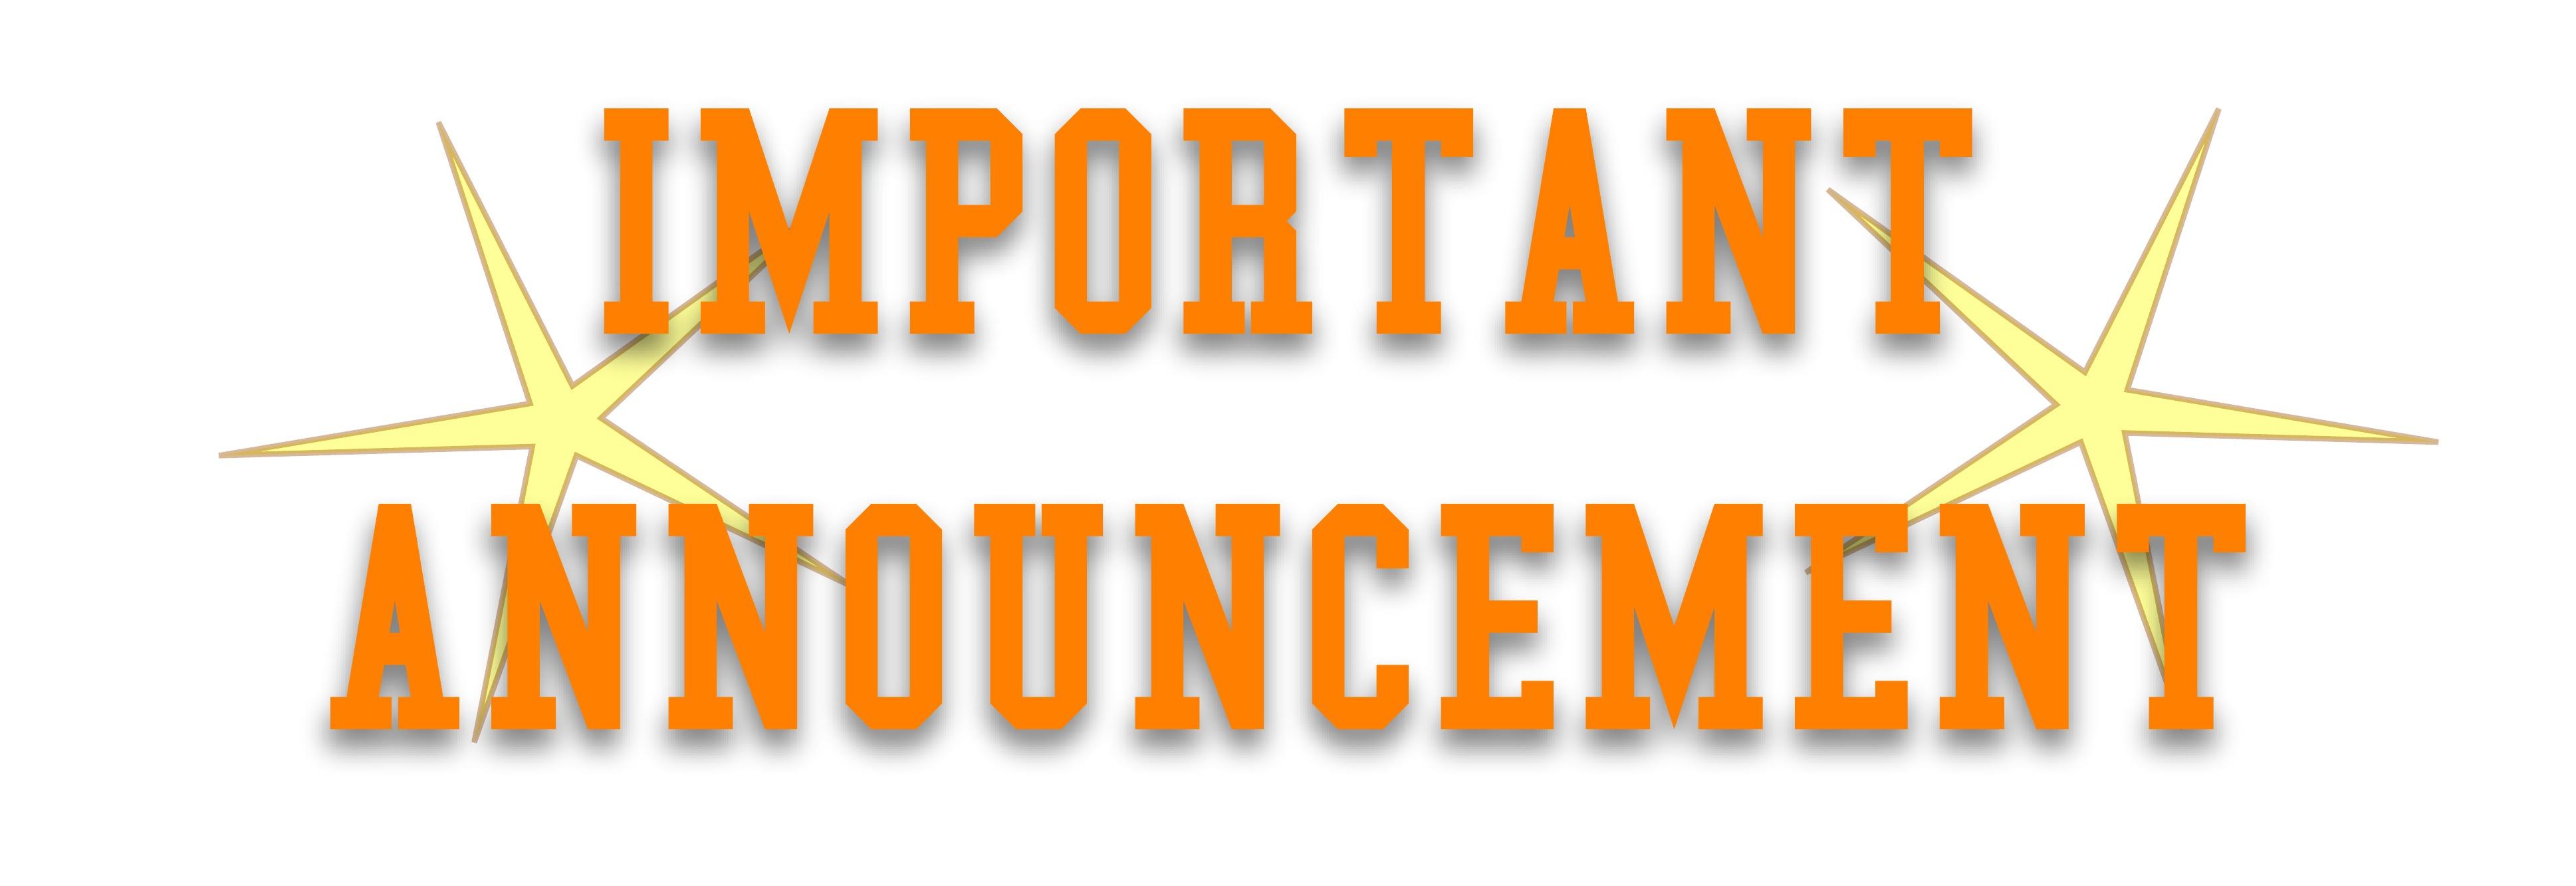 Notice clipart special announcement #11